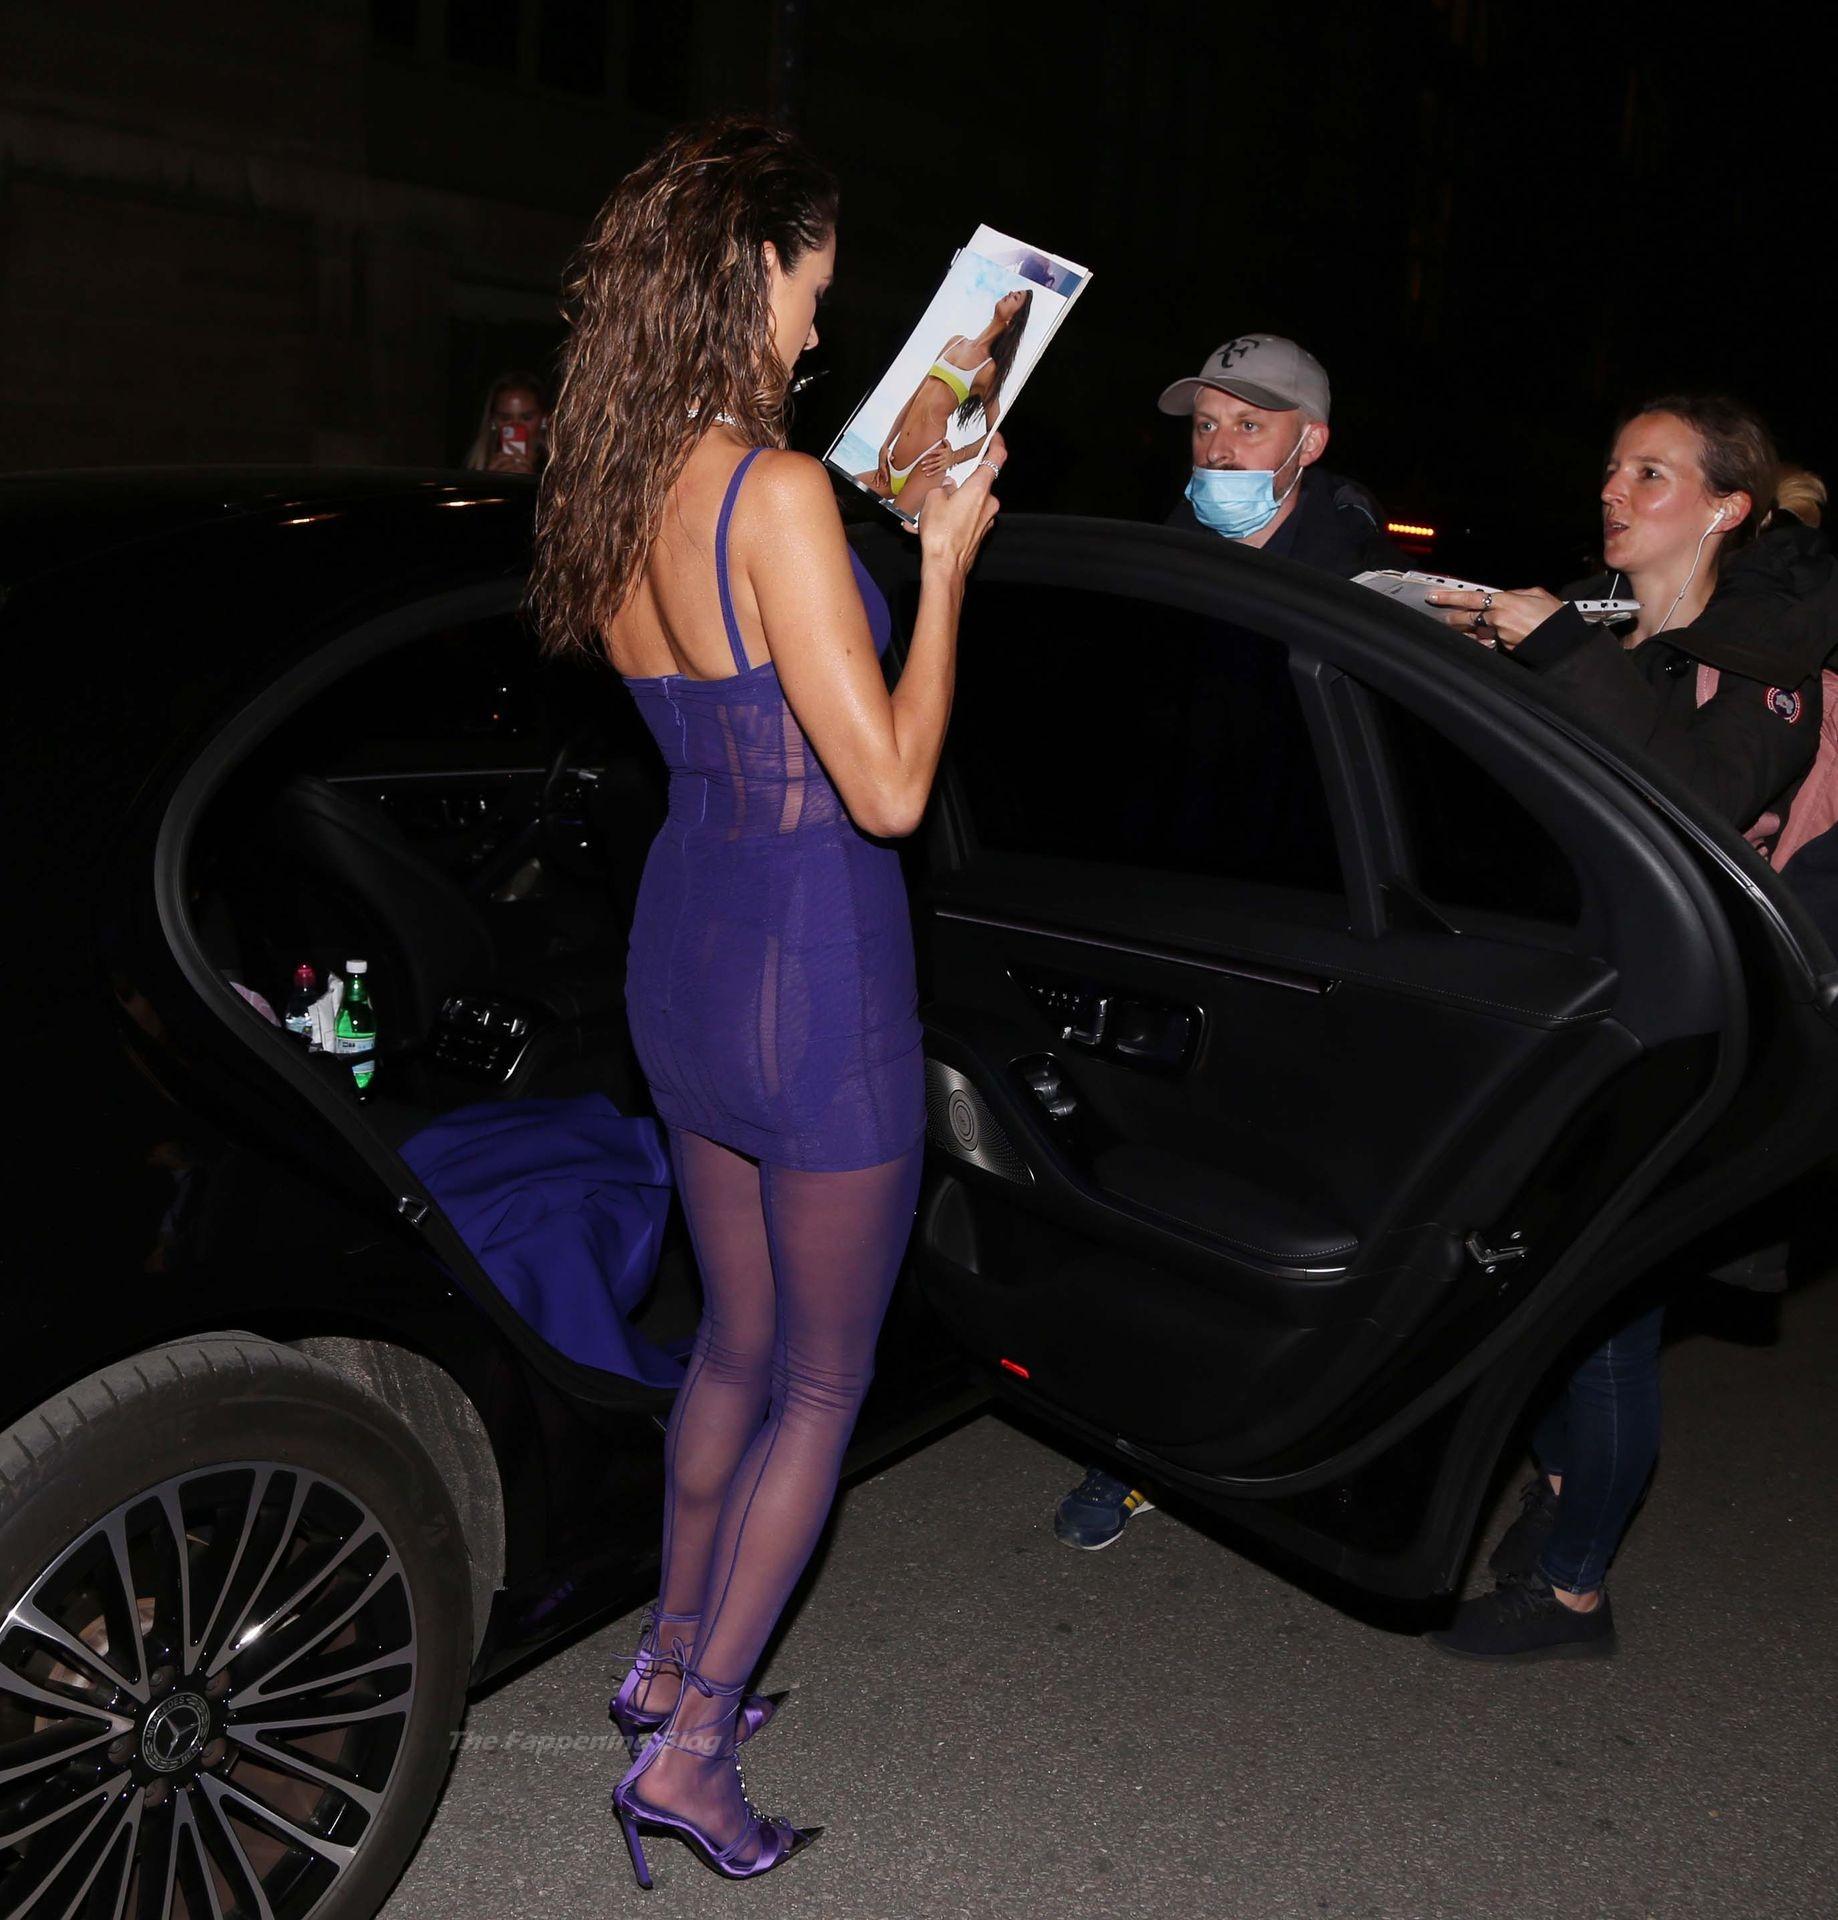 Alessandra-Ambrosio-Sexy-The-Fappening-Blog-69-1.jpg